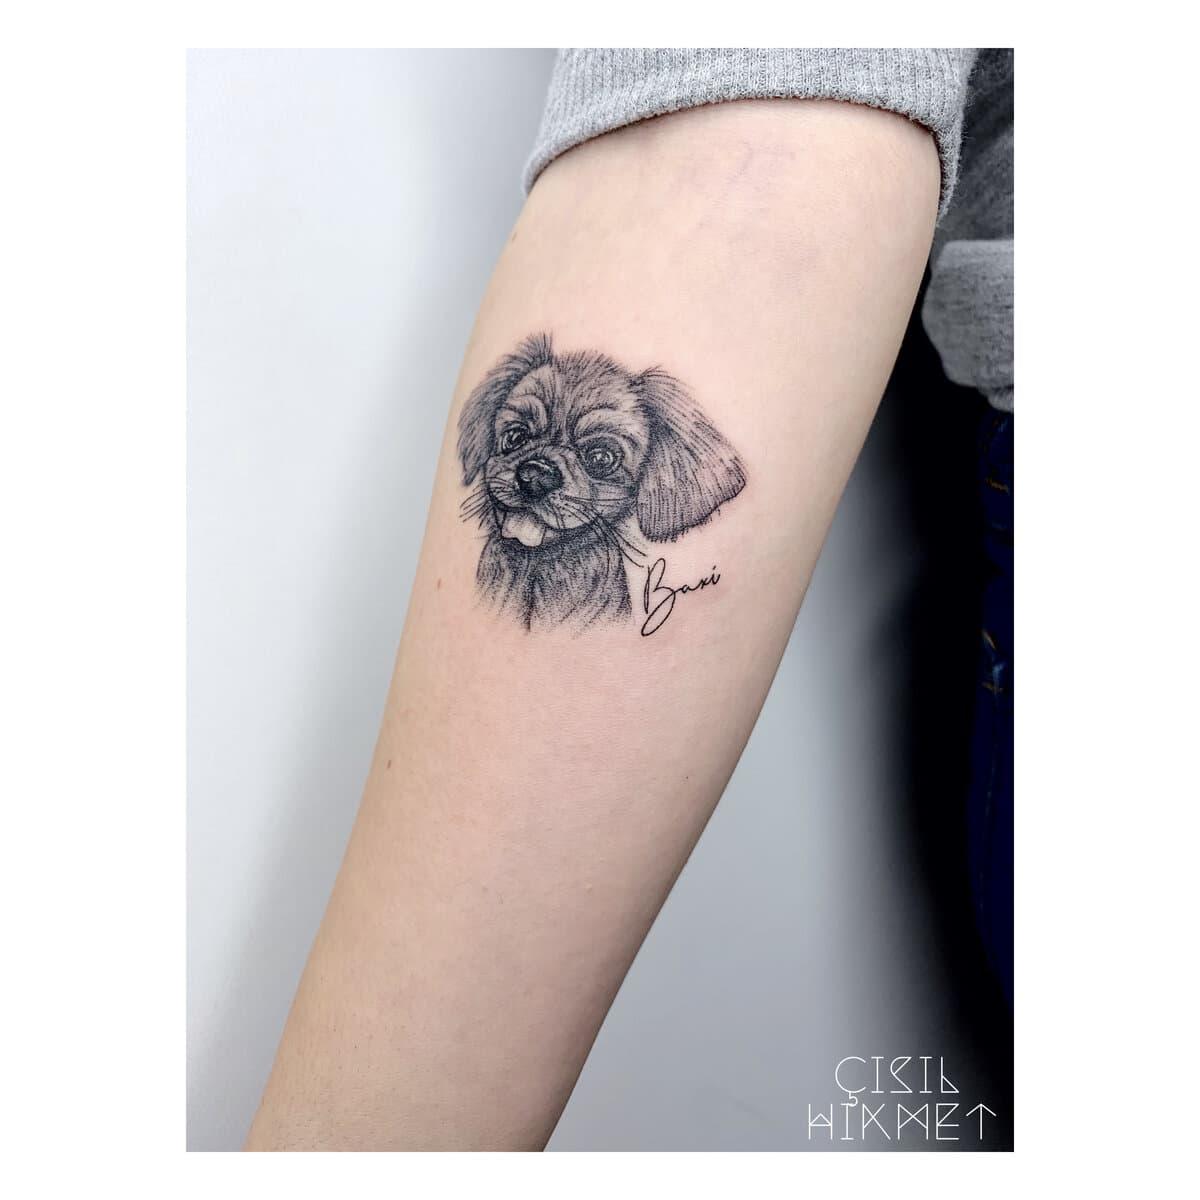 çisil-hikmet-tattoo-artist-portrait-dog